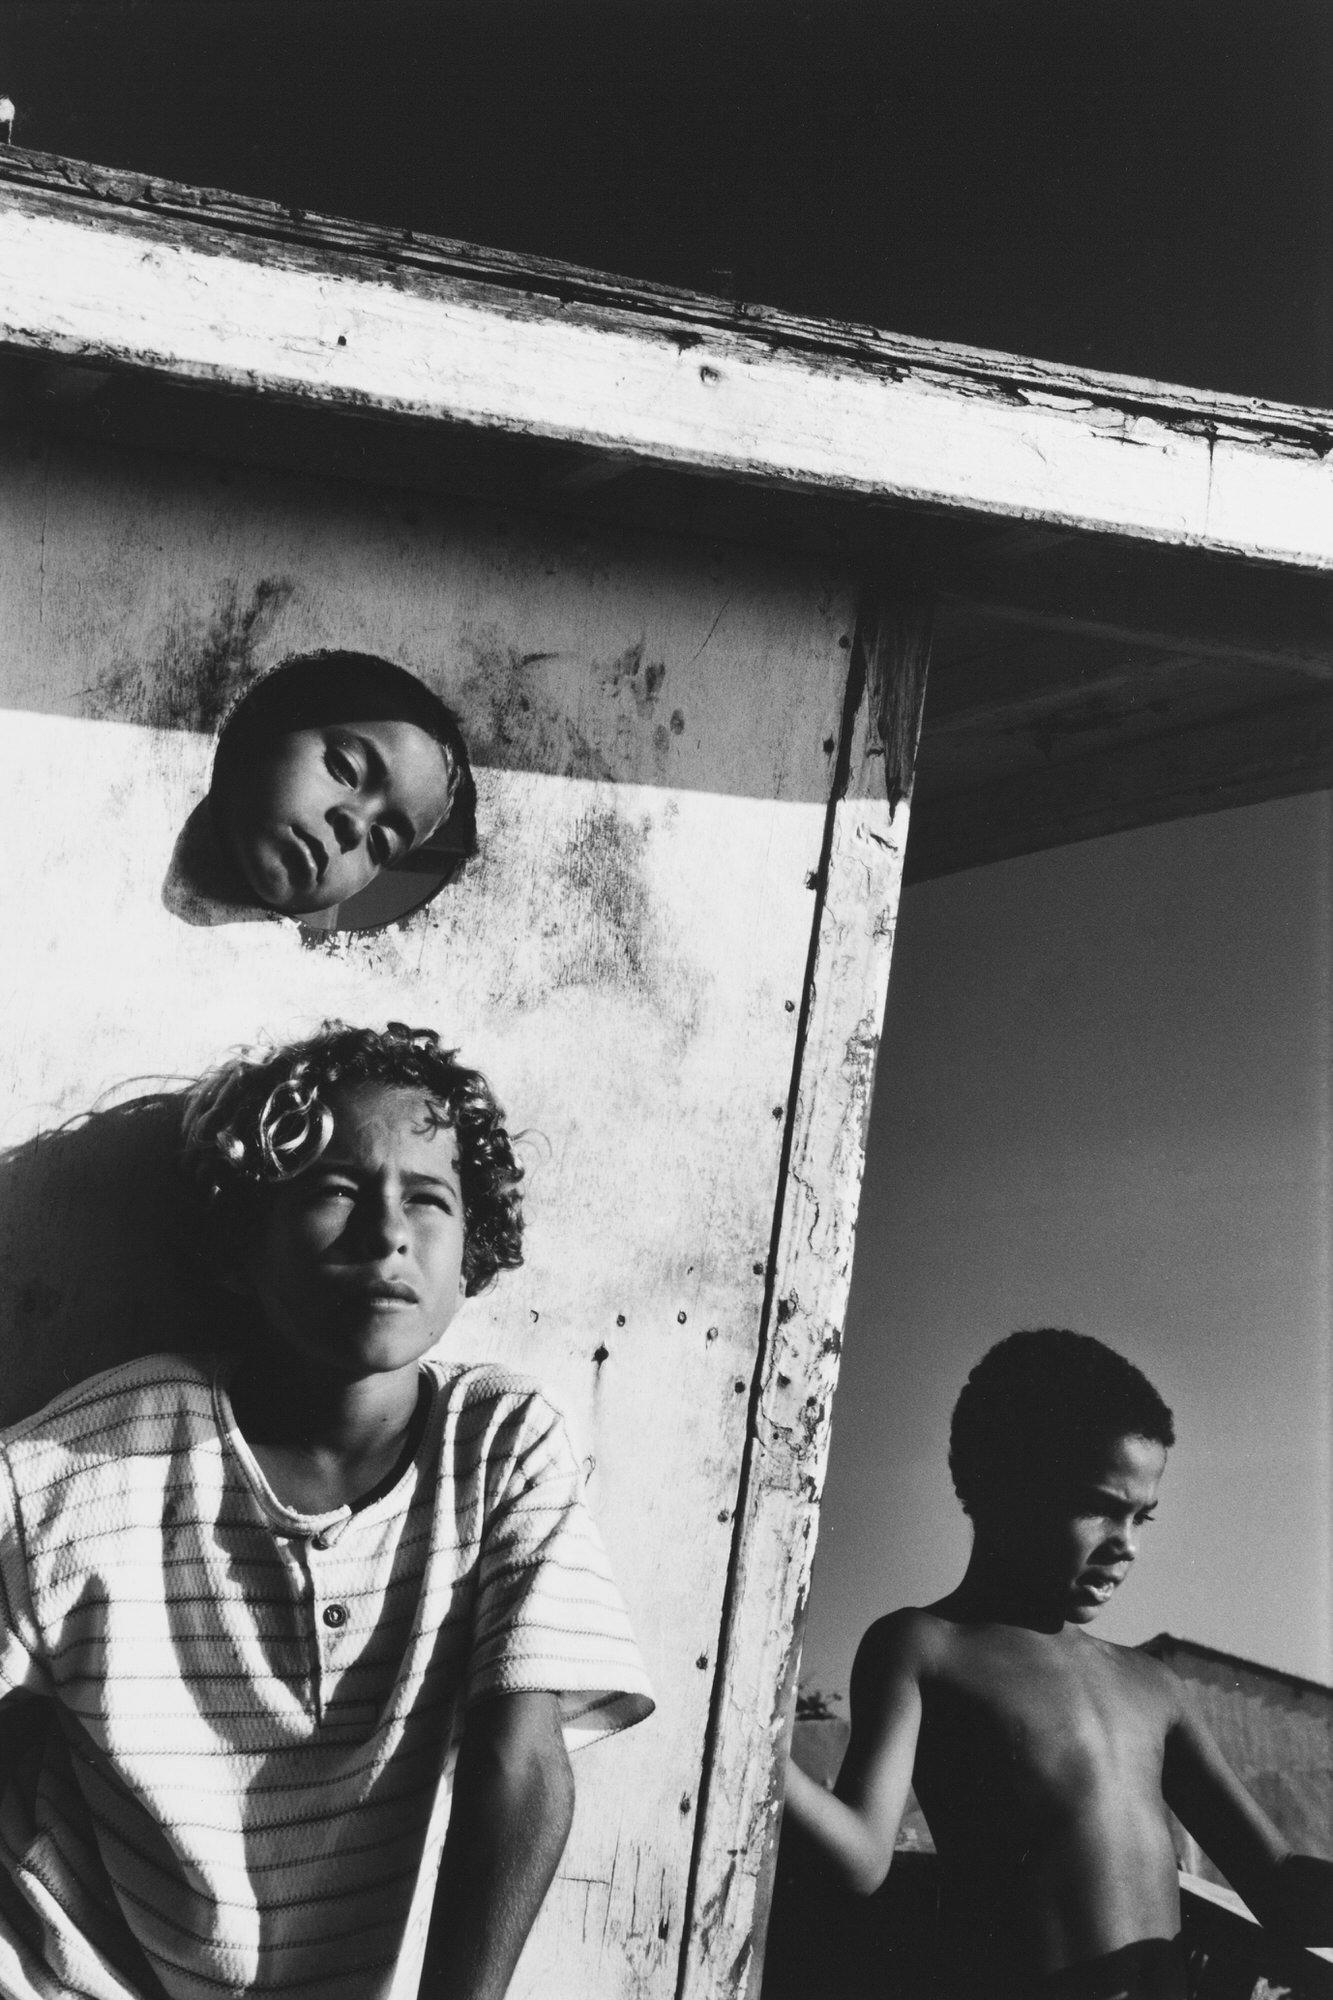 Enrico Marone的黑白摄影